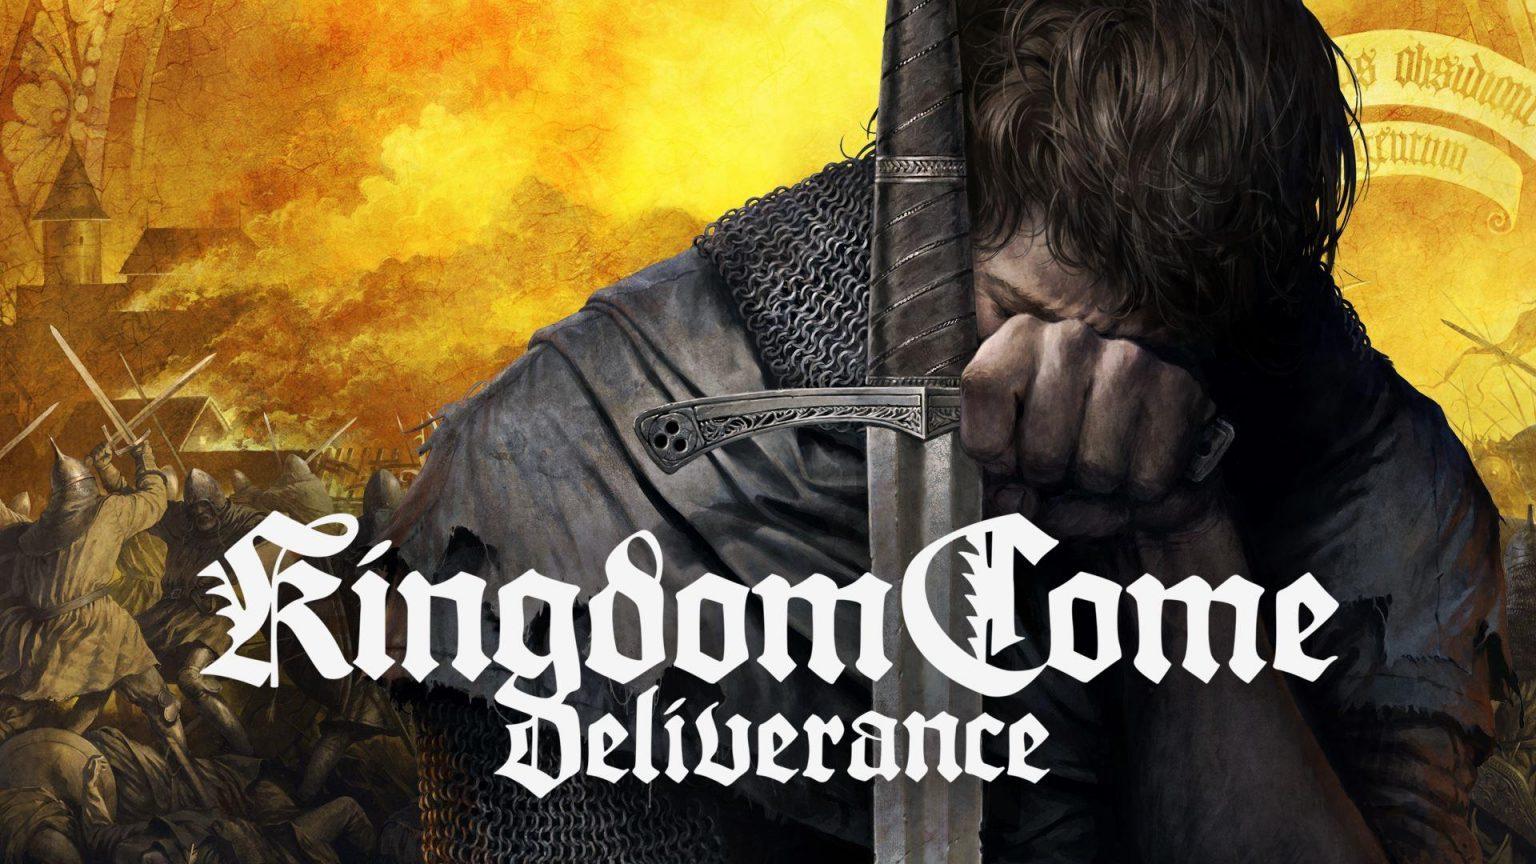 Kingdom Come Deliverance Nintendo Switch Apk iOS Latest Version Free Download